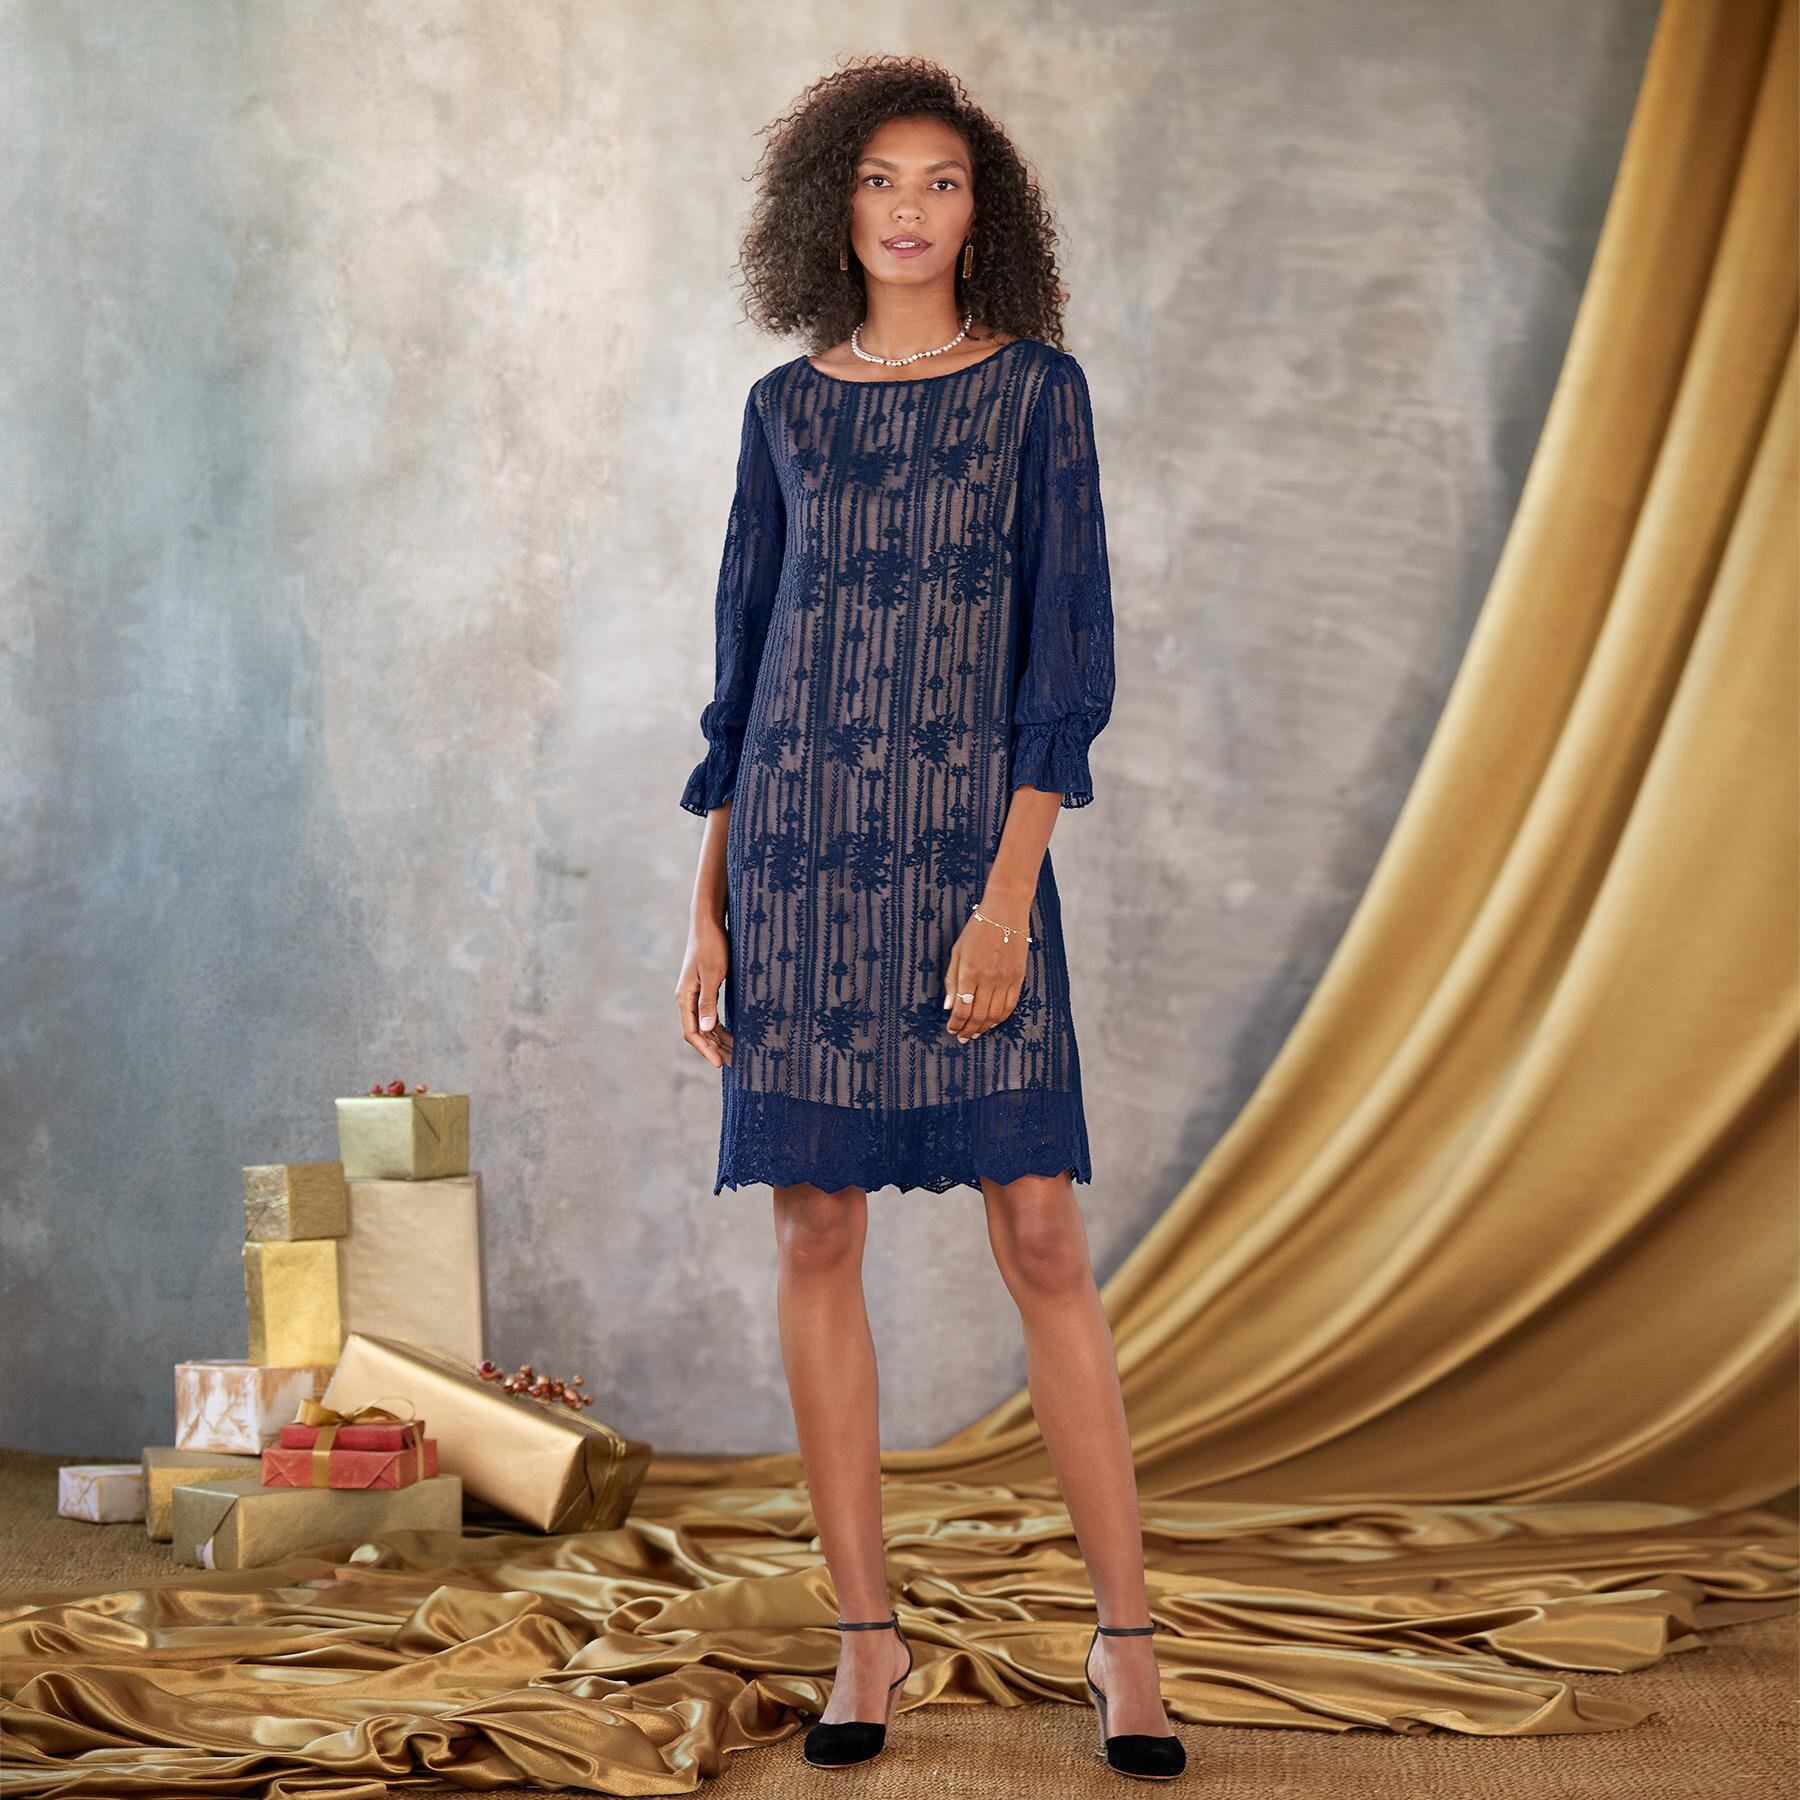 EMMA GRACEFUL SHEATH DRESS - PETITES: View 1